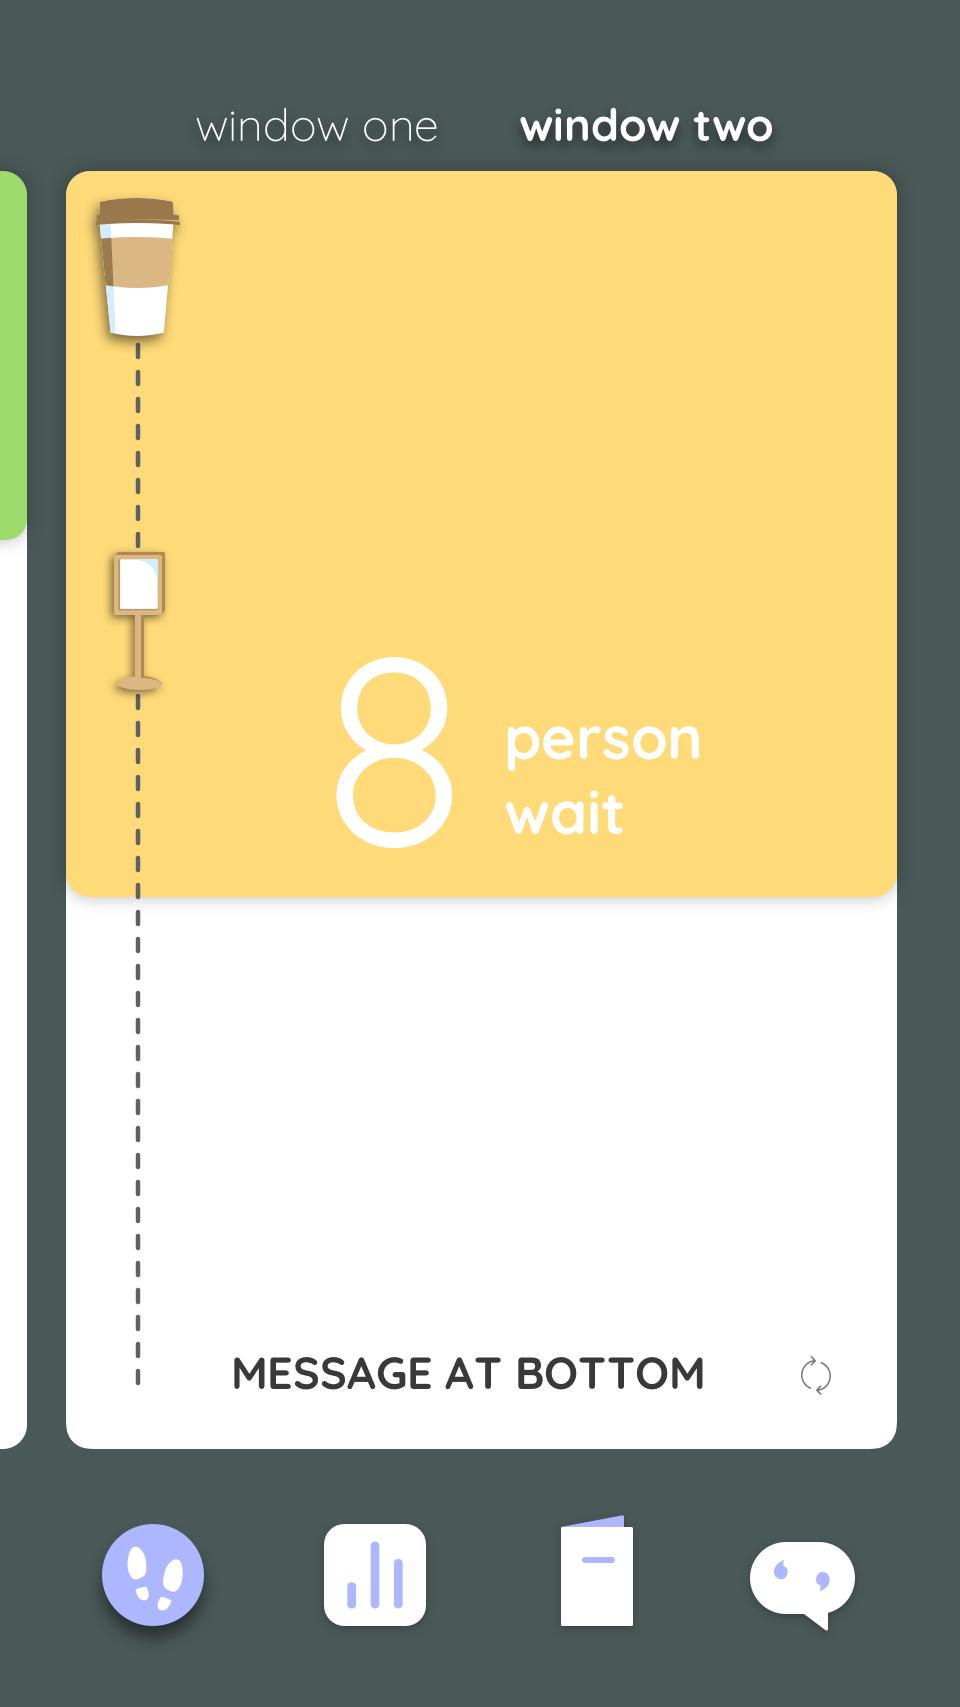 LINE 2 (15 PEOPLE).png